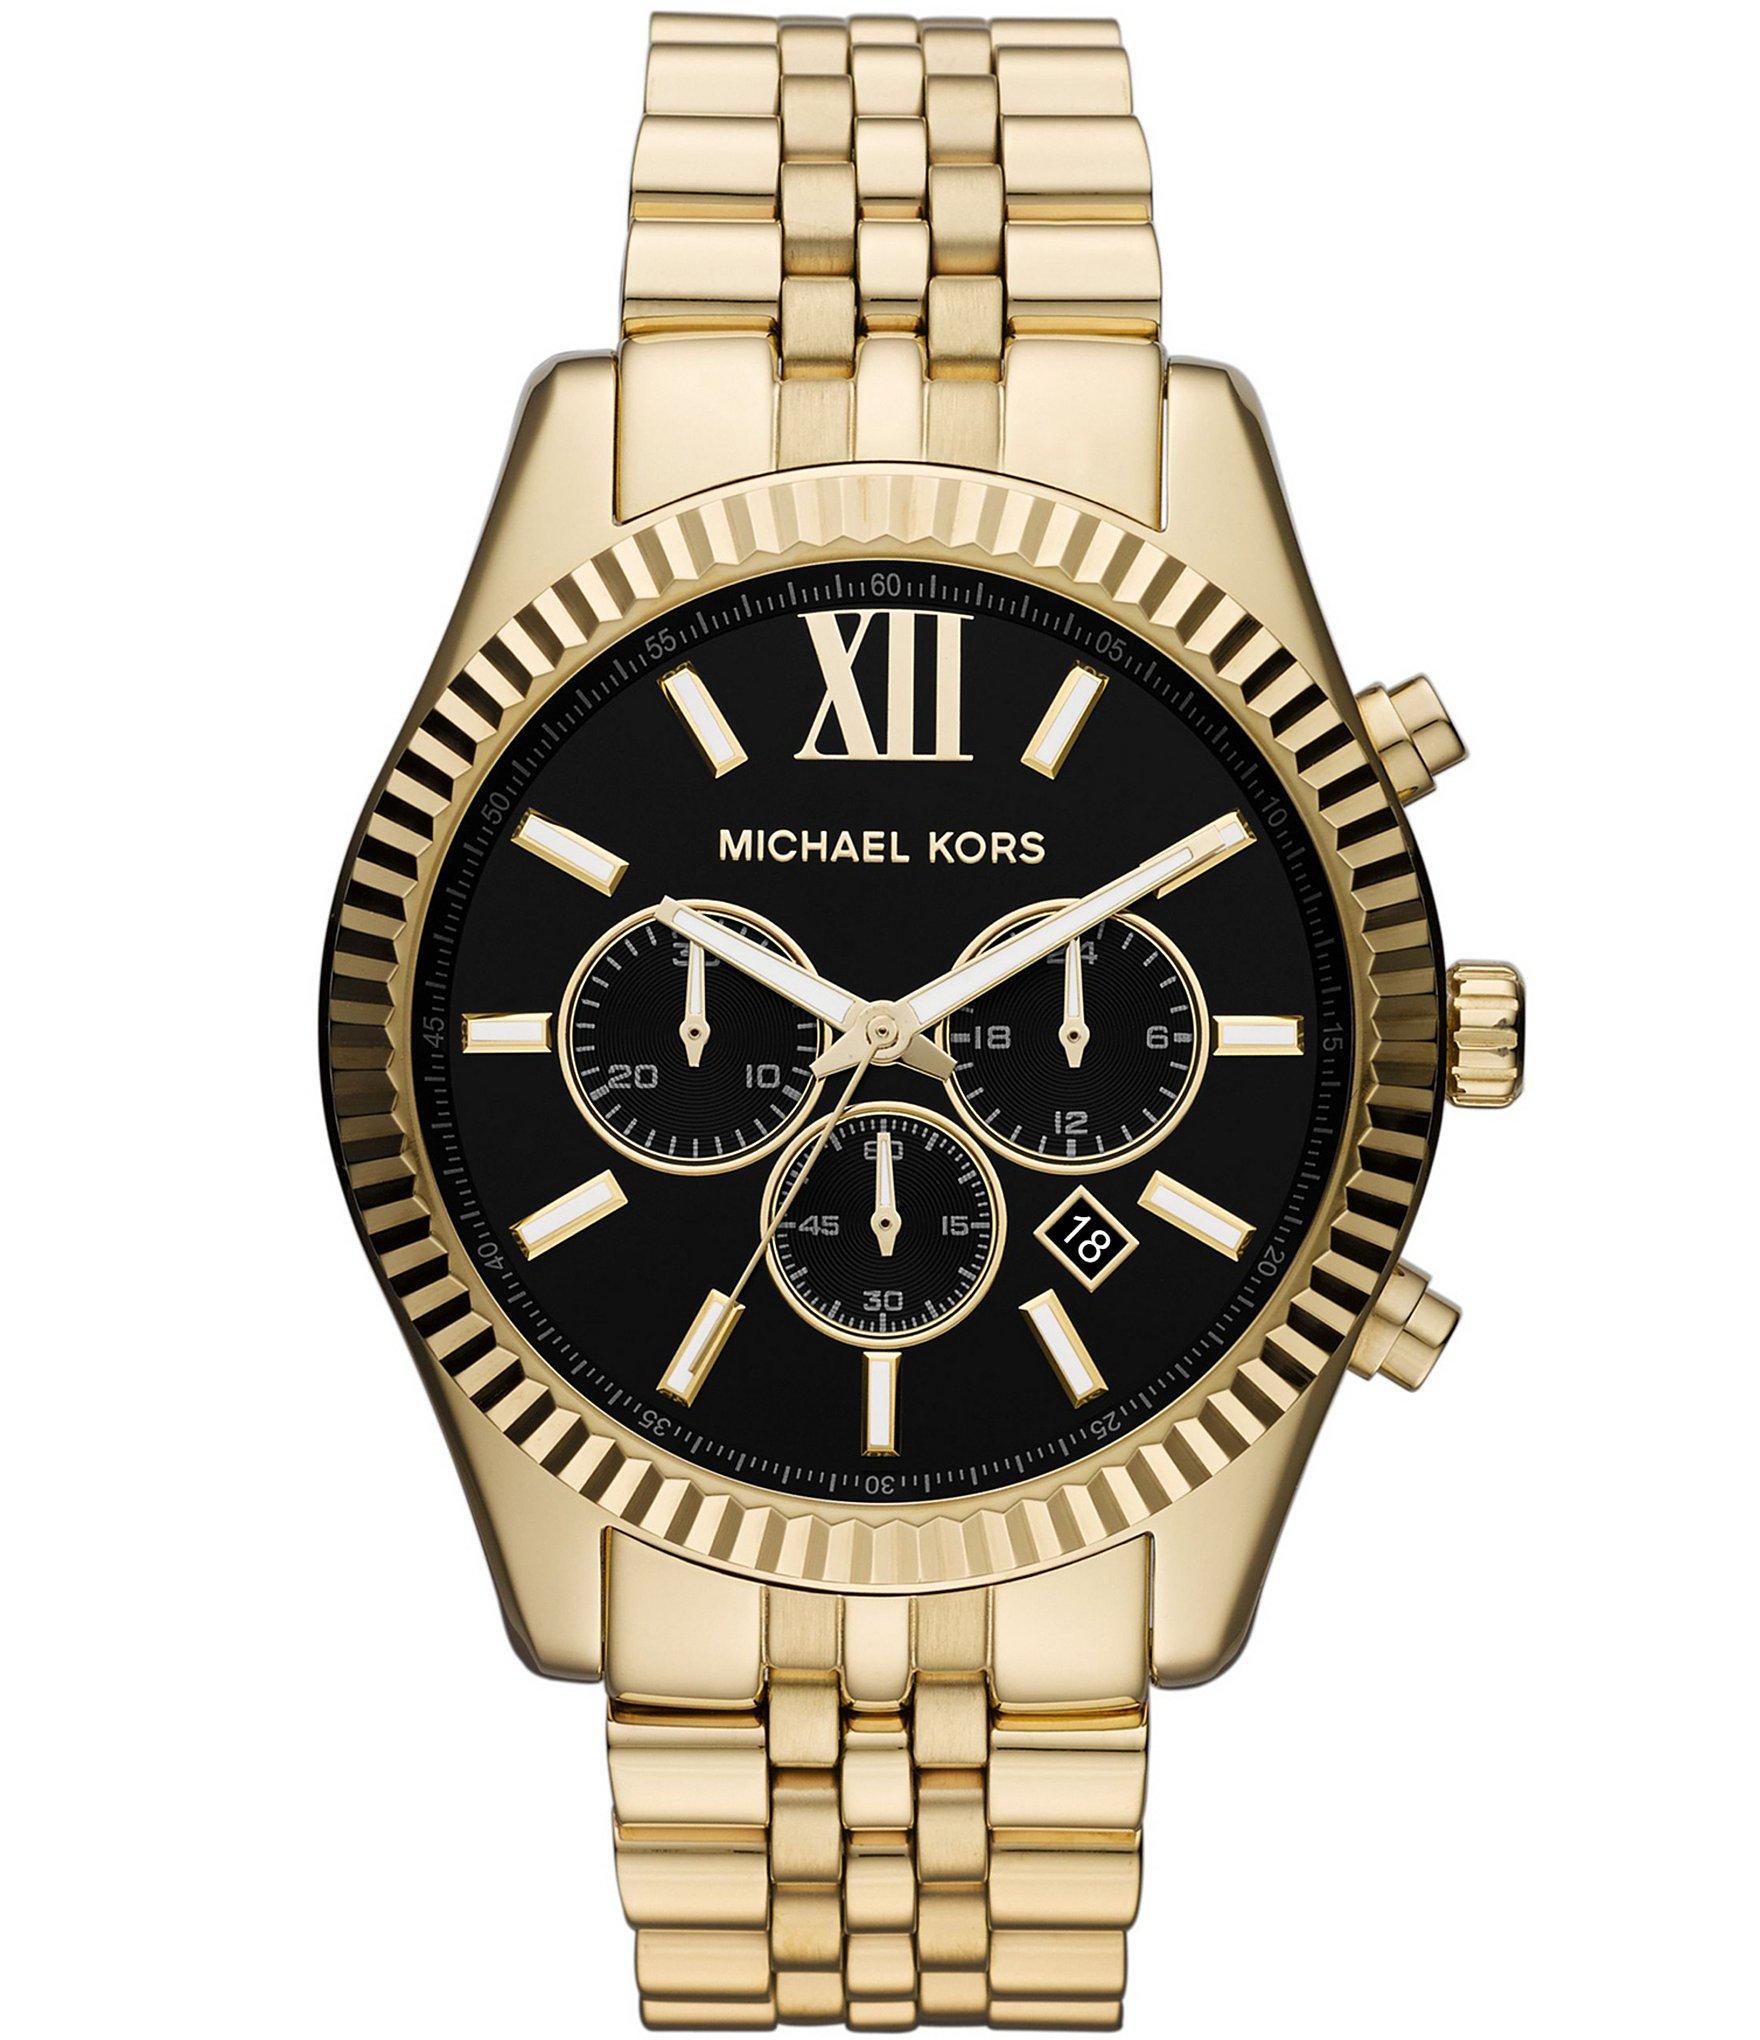 michael kors gold stainless steel chronograph